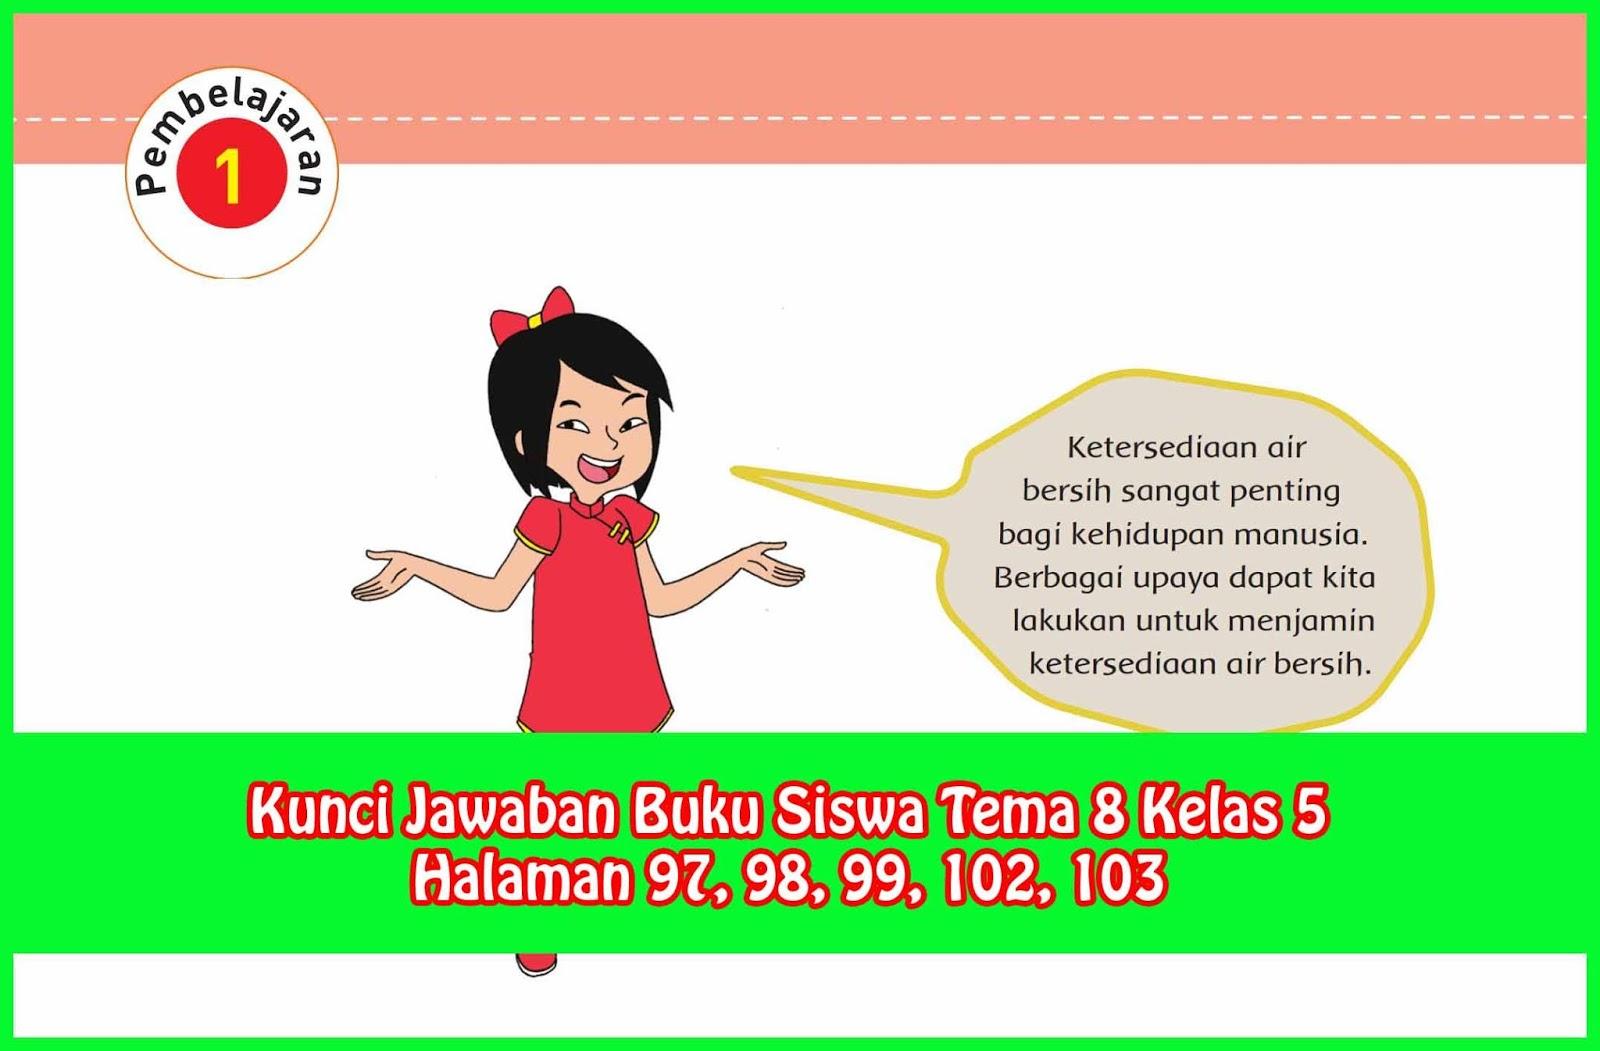 Get Jawaban Buku Paket Bahasa Jawa Kelas 9 Halaman 4 Dan 5  Pics